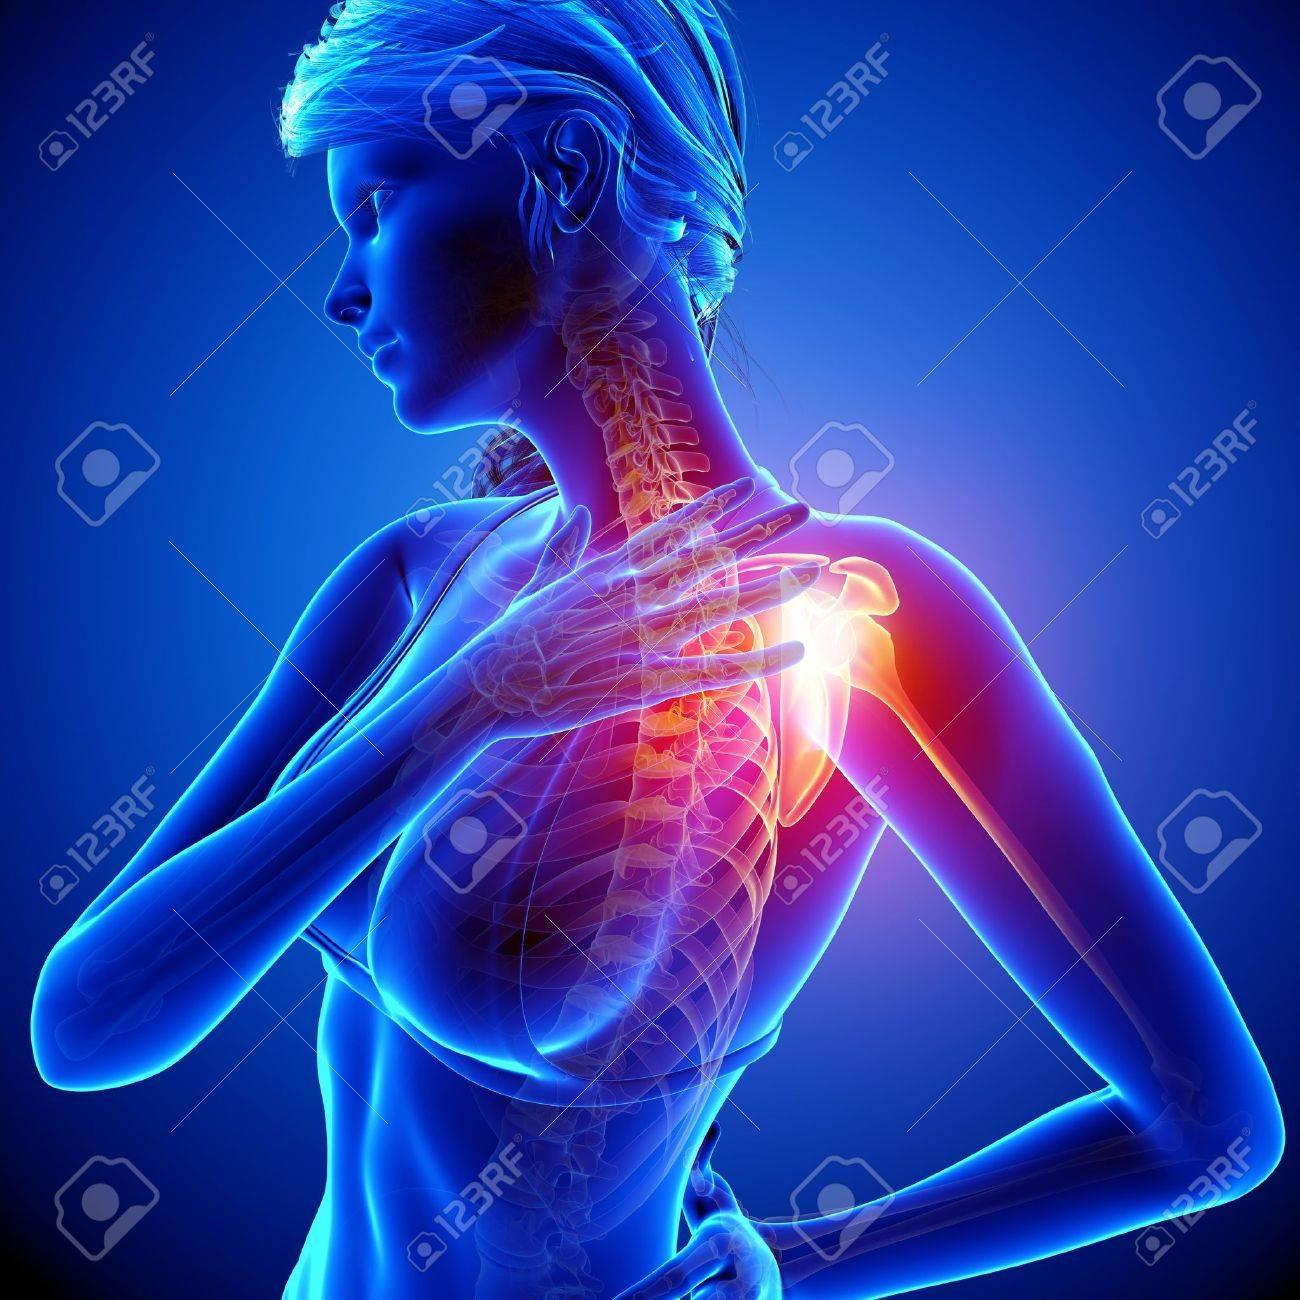 Illustration Of Female Shoulder Pain Anatomy In Blue Stock Photo ...